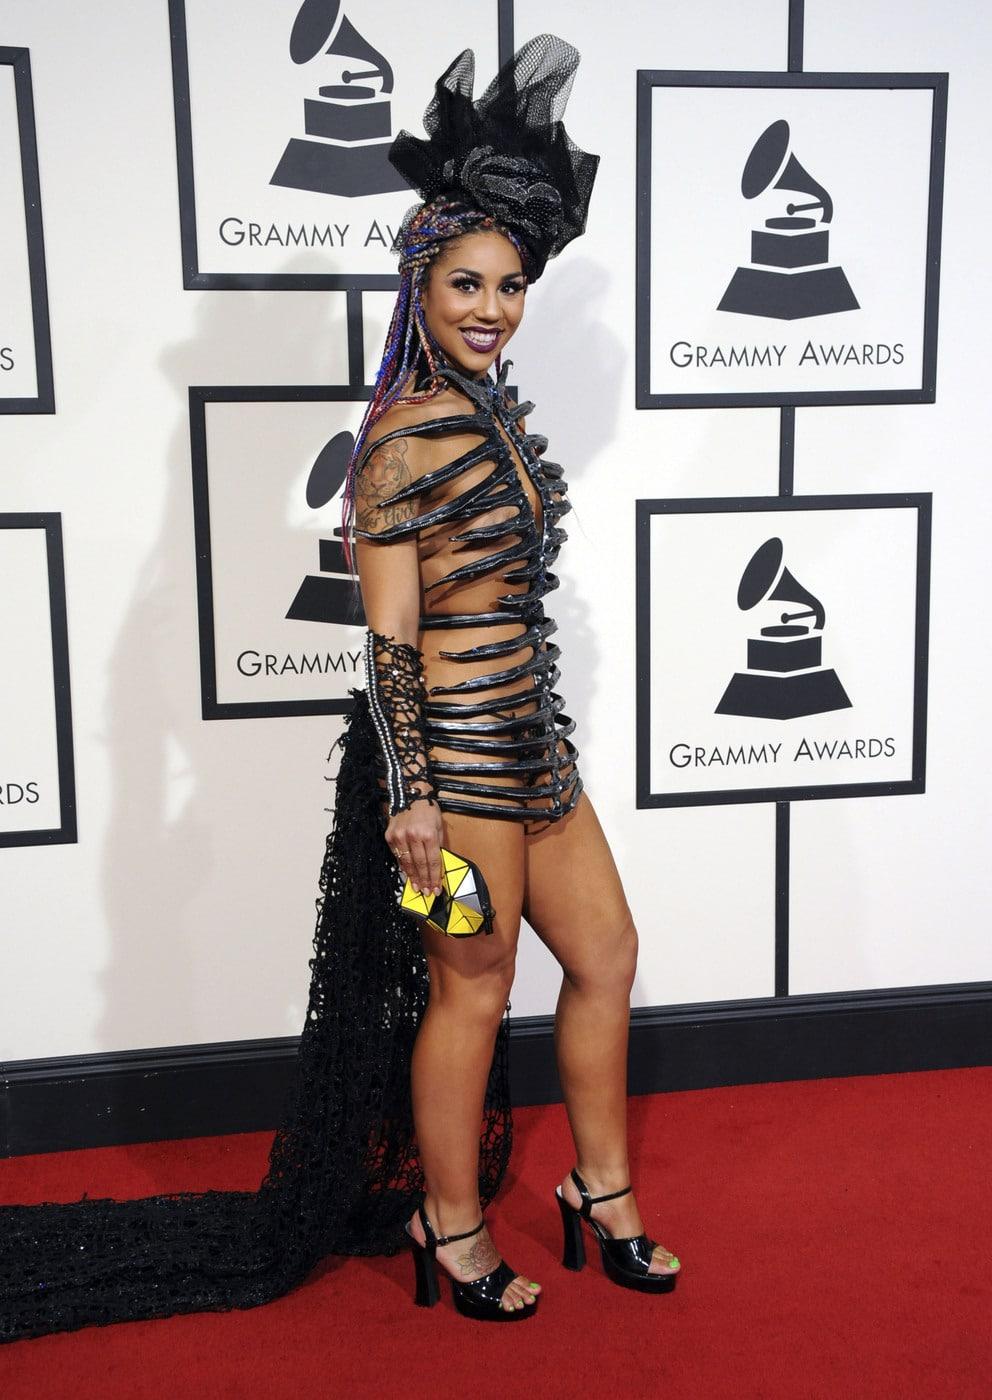 Joy Villa at the 2016 Grammy Awards